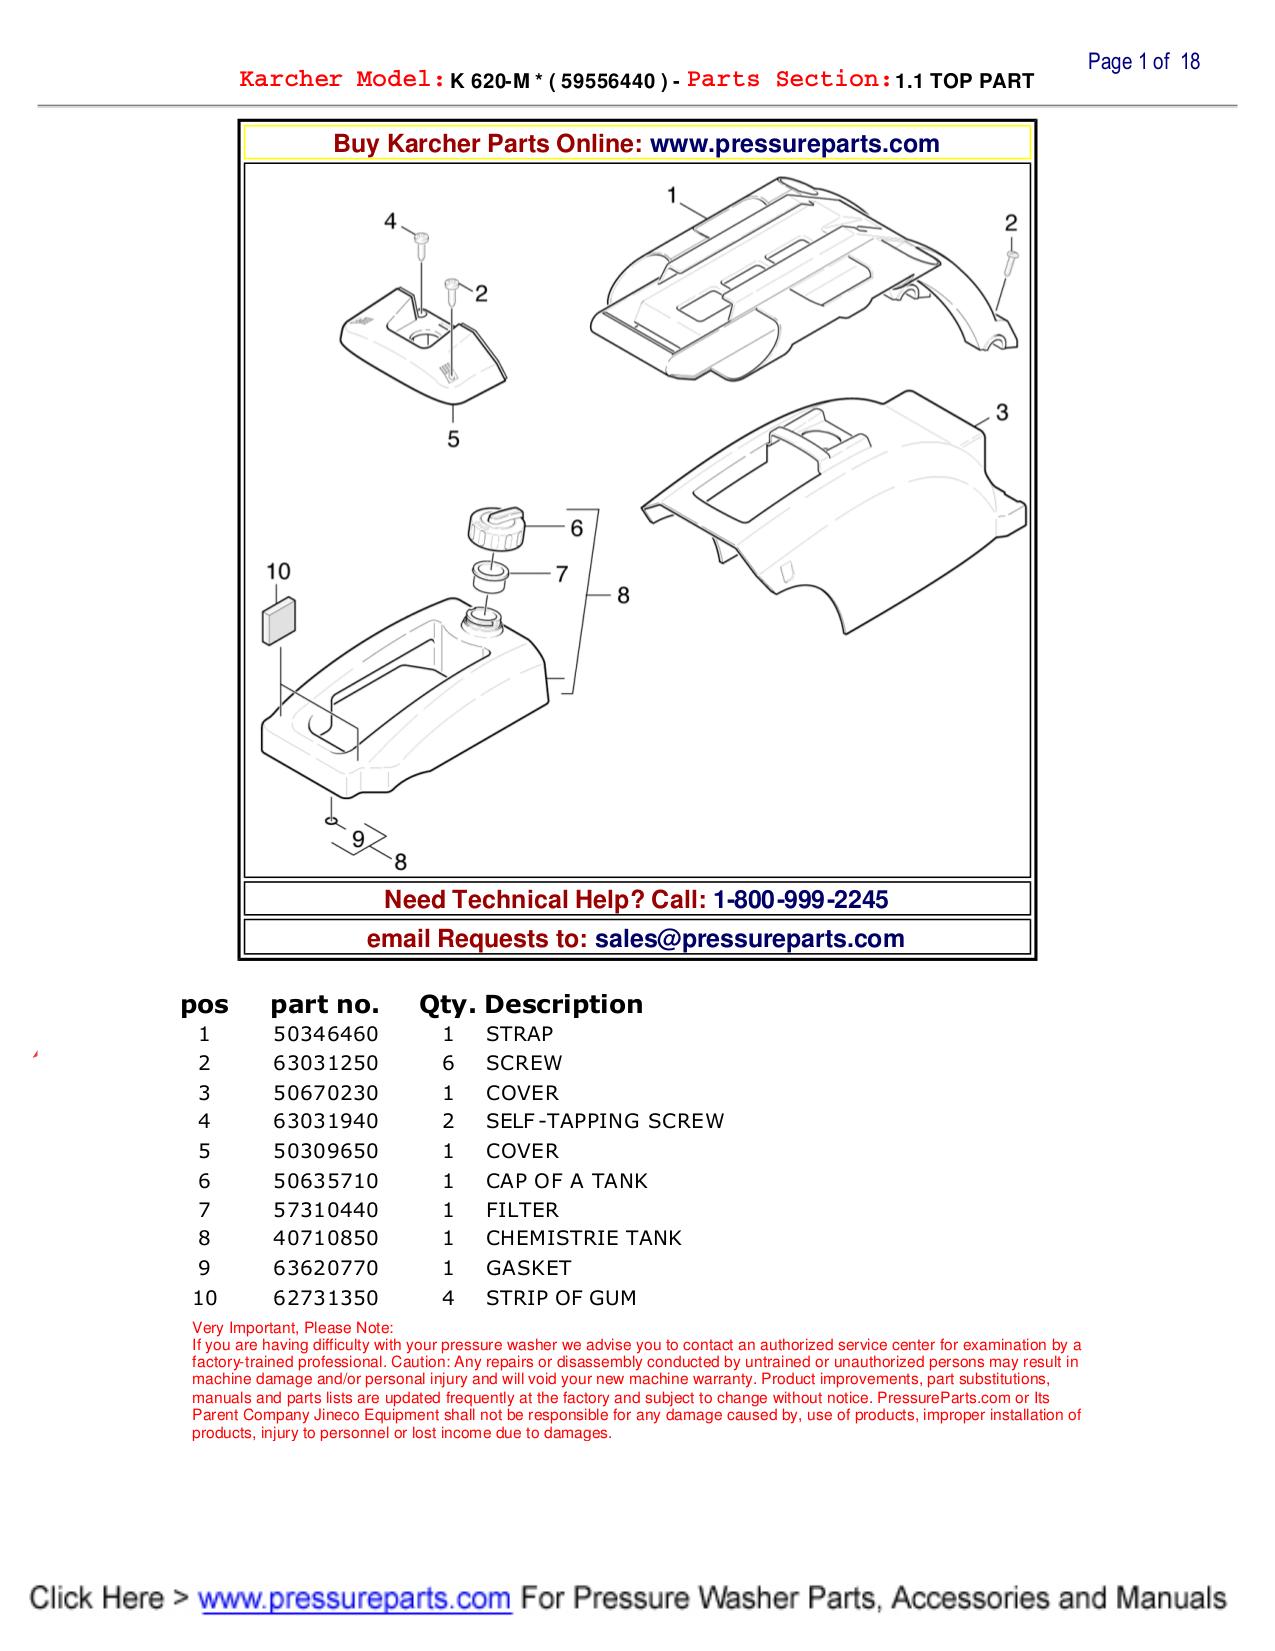 Karcher K 3 96 manual